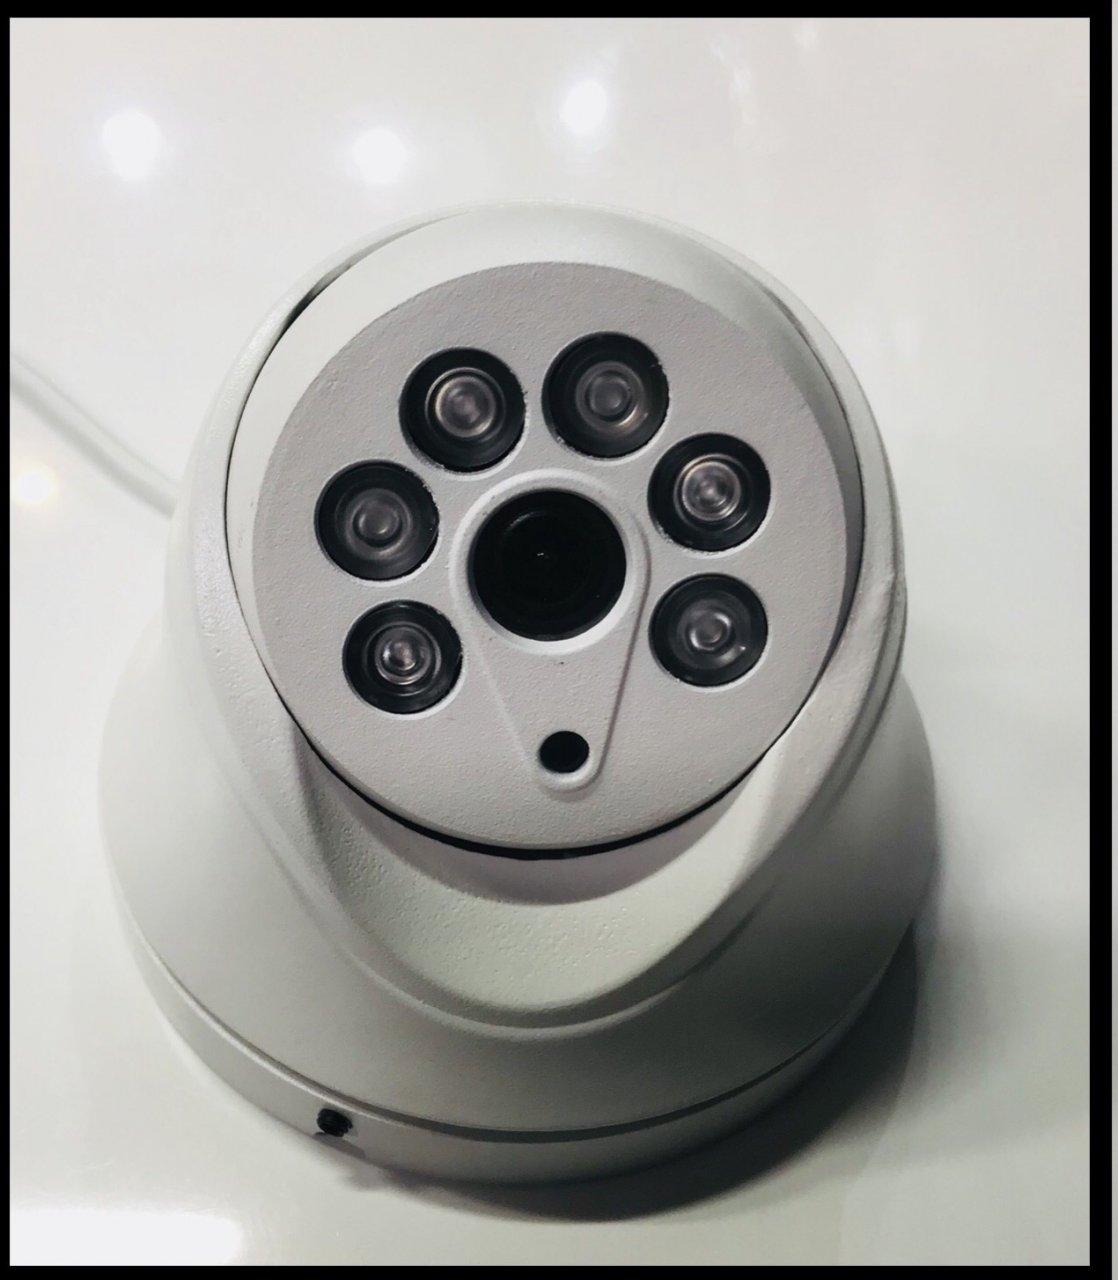 دوربين مداربسته دام ٢ مگاپيكسل HD مدل z-66